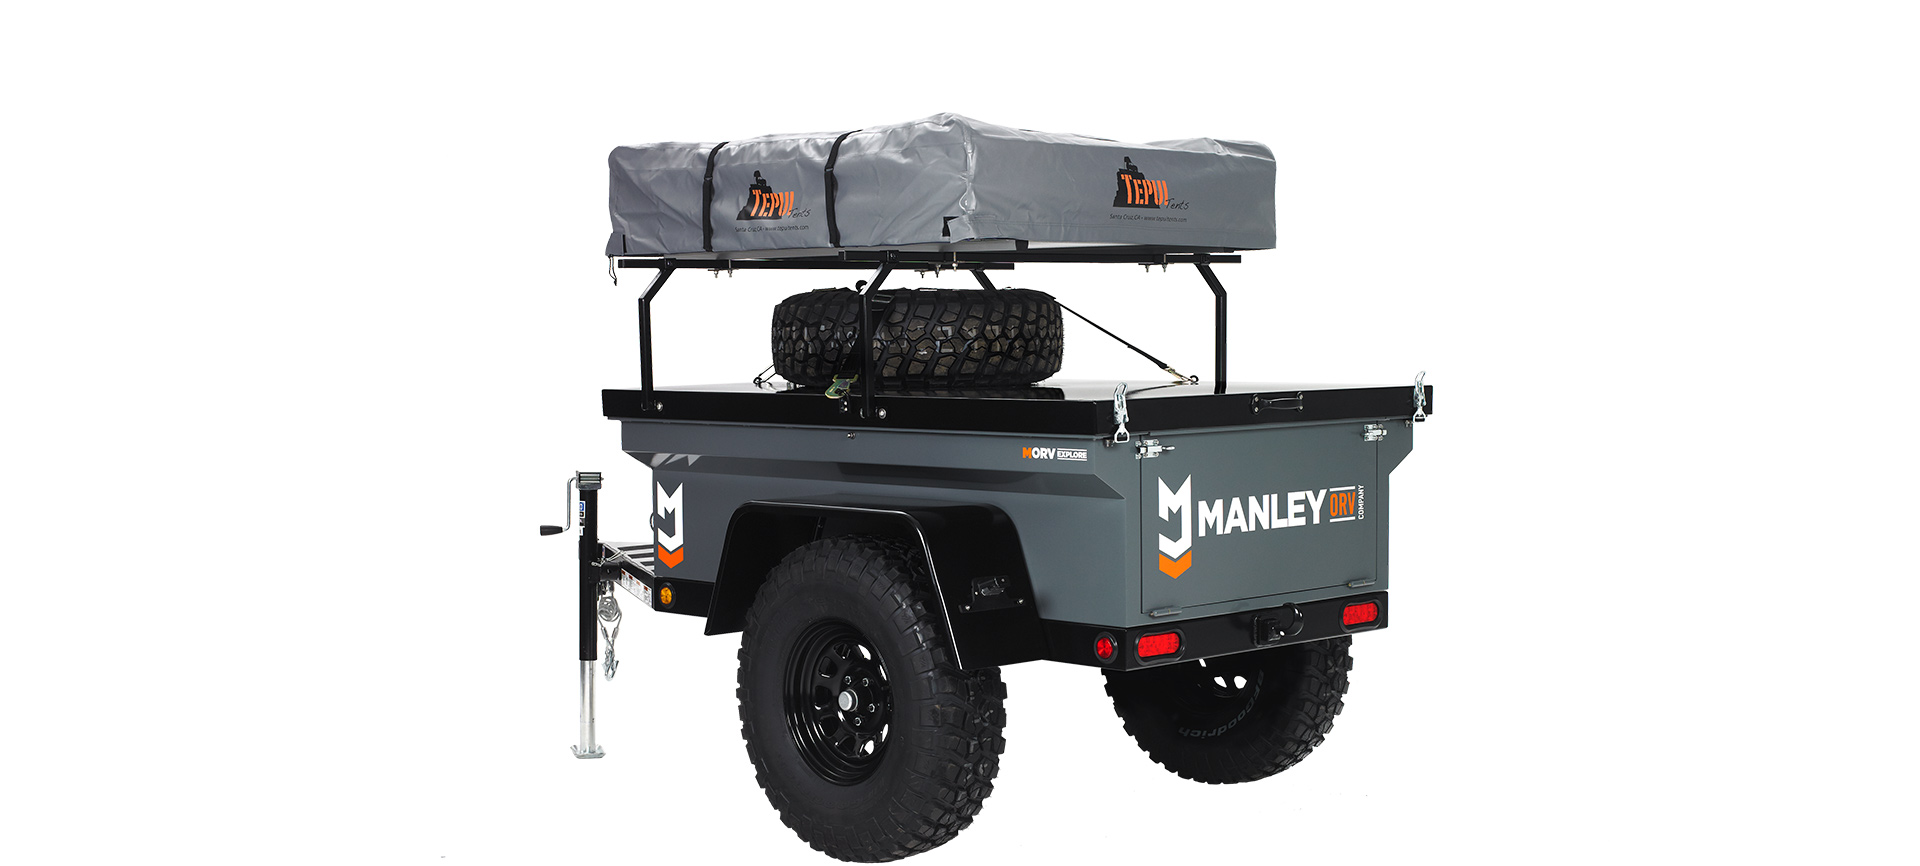 Manleyexplore.jpg